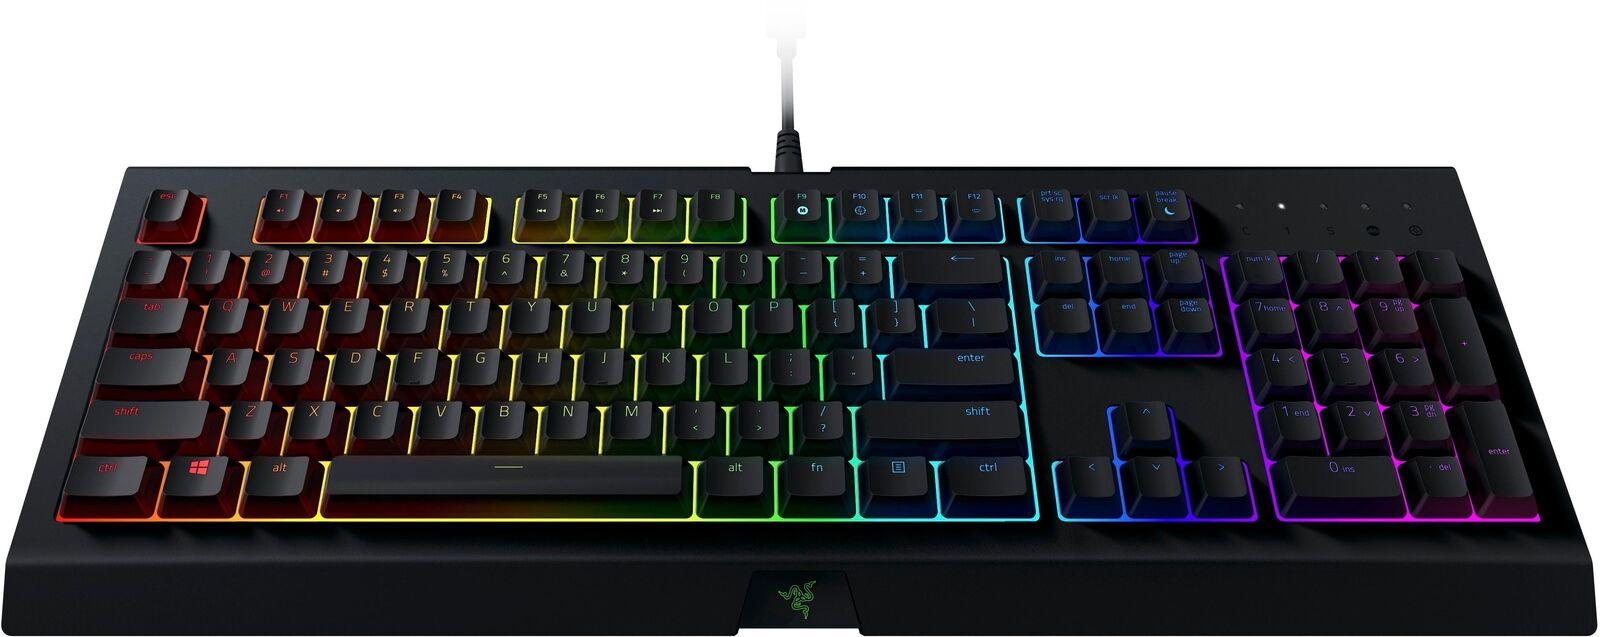 Razer Cynosa Chroma Black USB